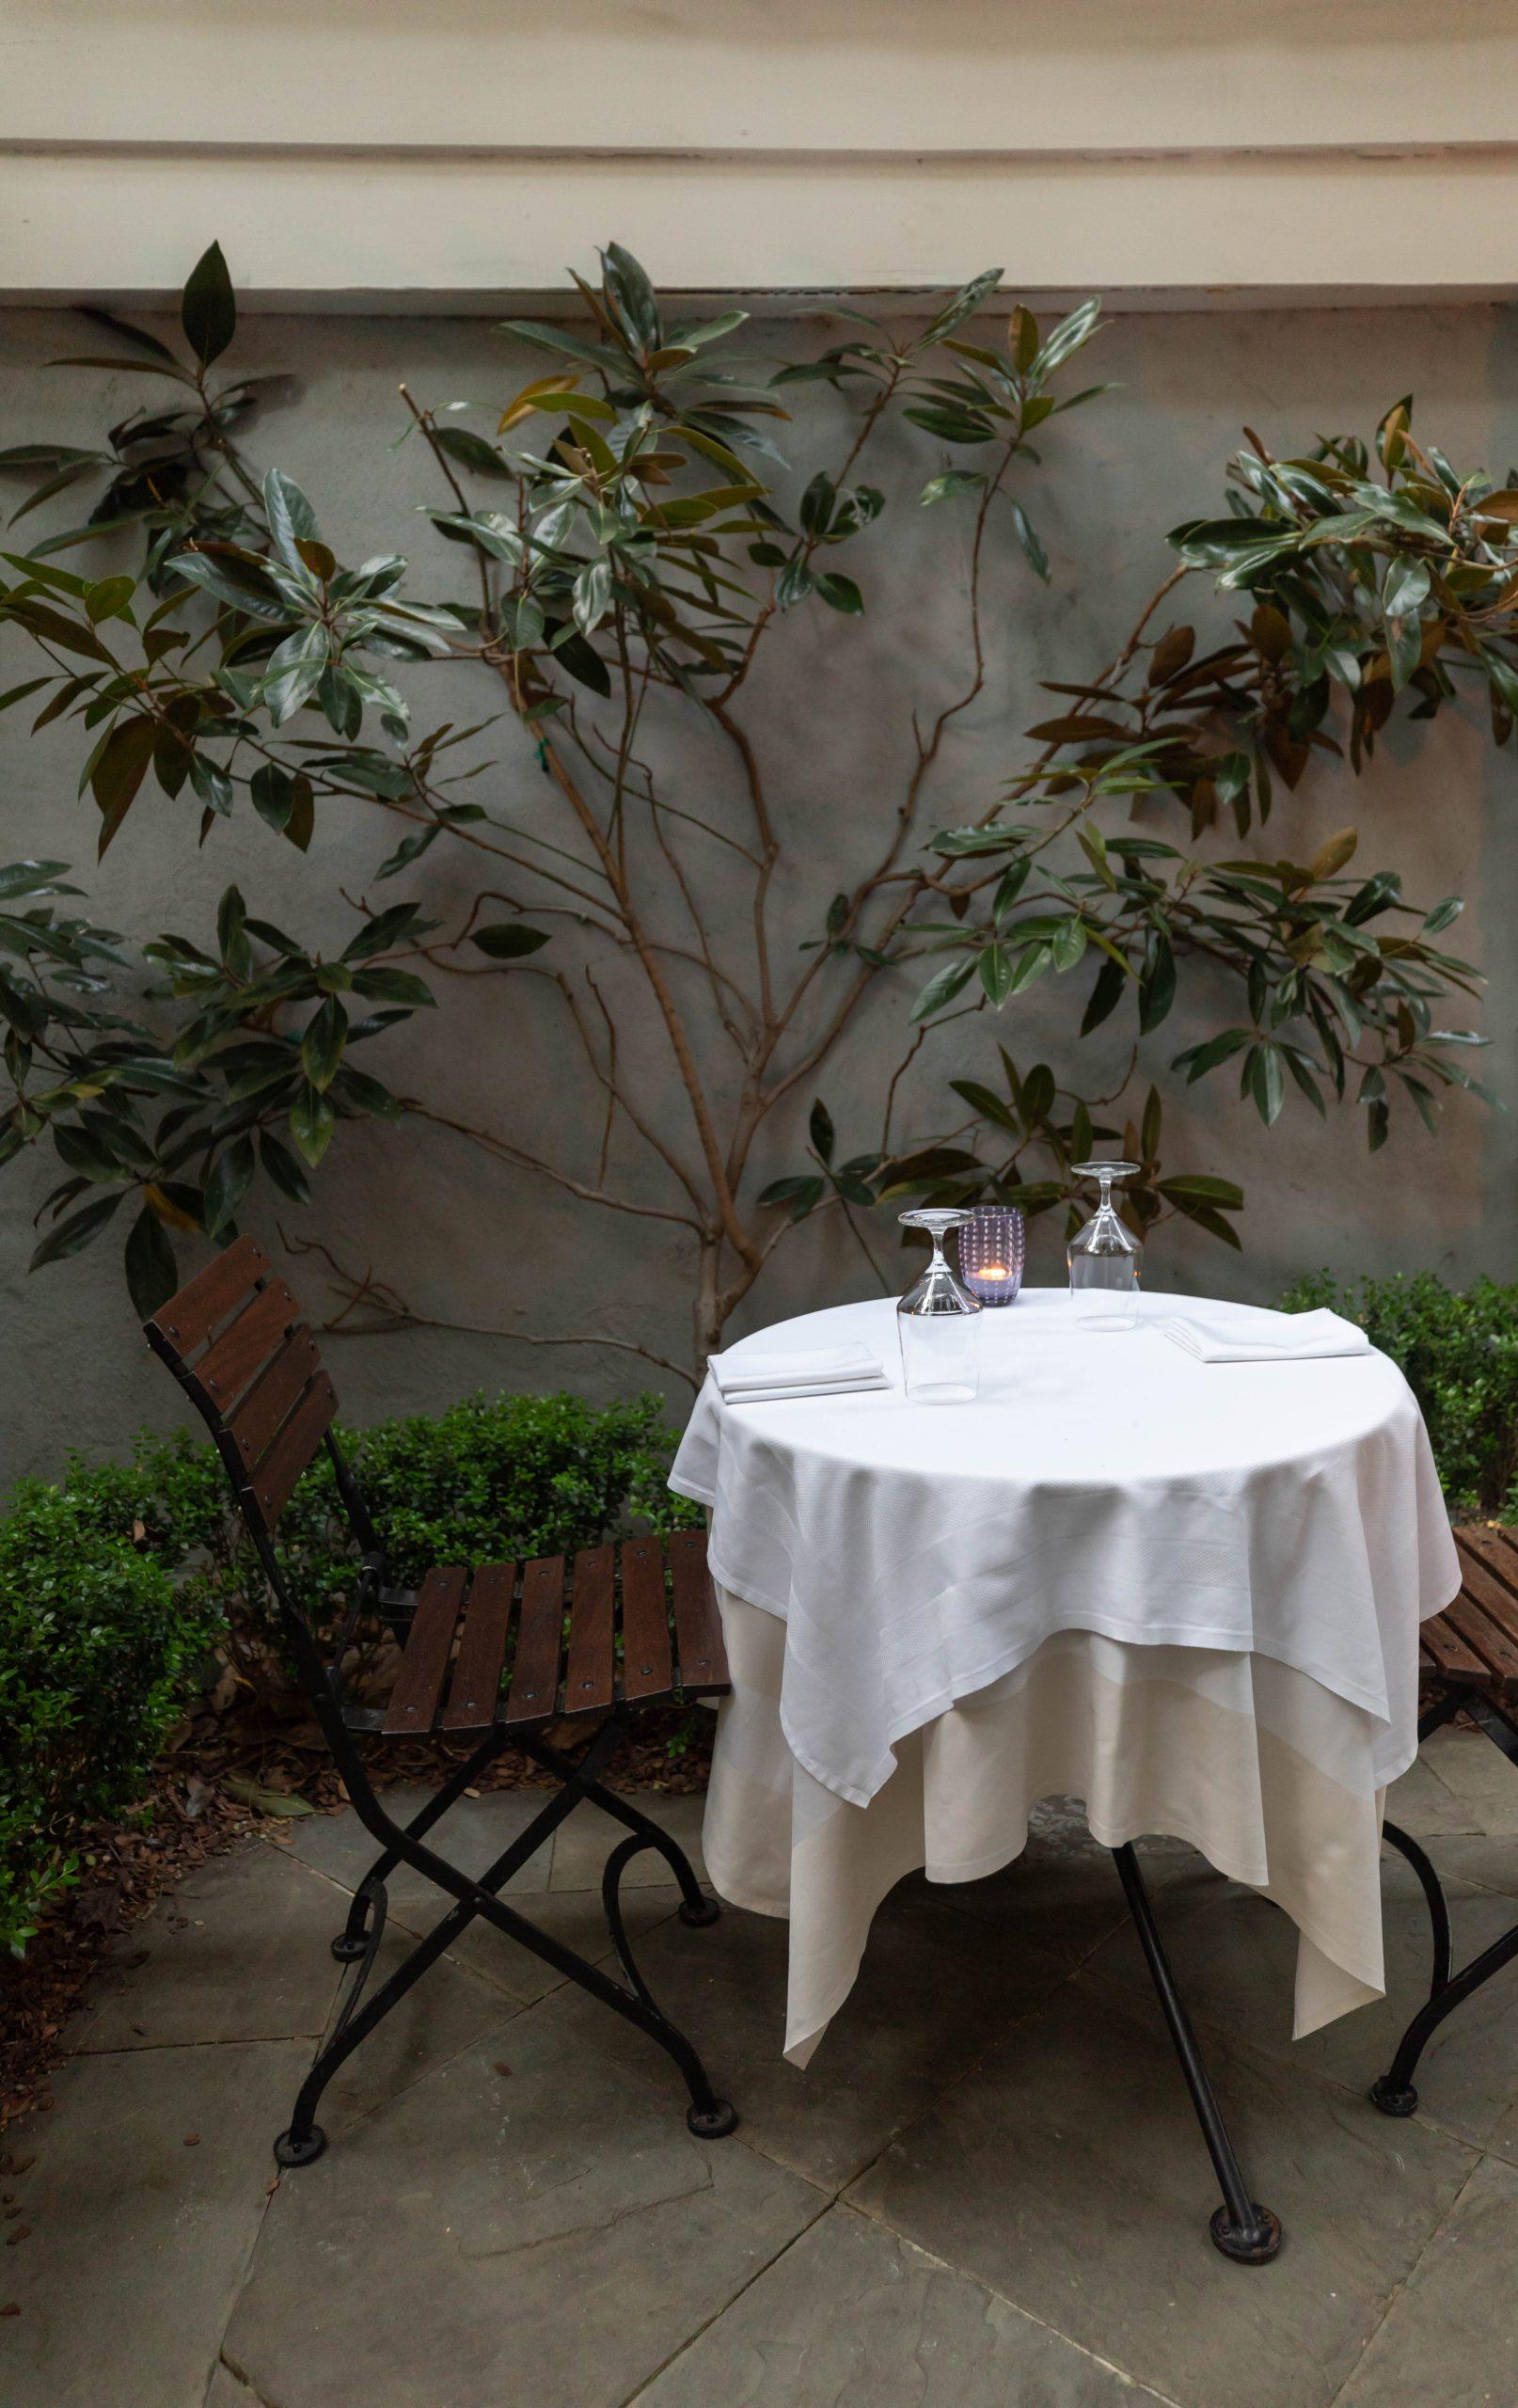 Zero George Restaurant + Bar in Charleston South Carolina Photographed and Written by Luxury Travel Writer Annie Fairfax